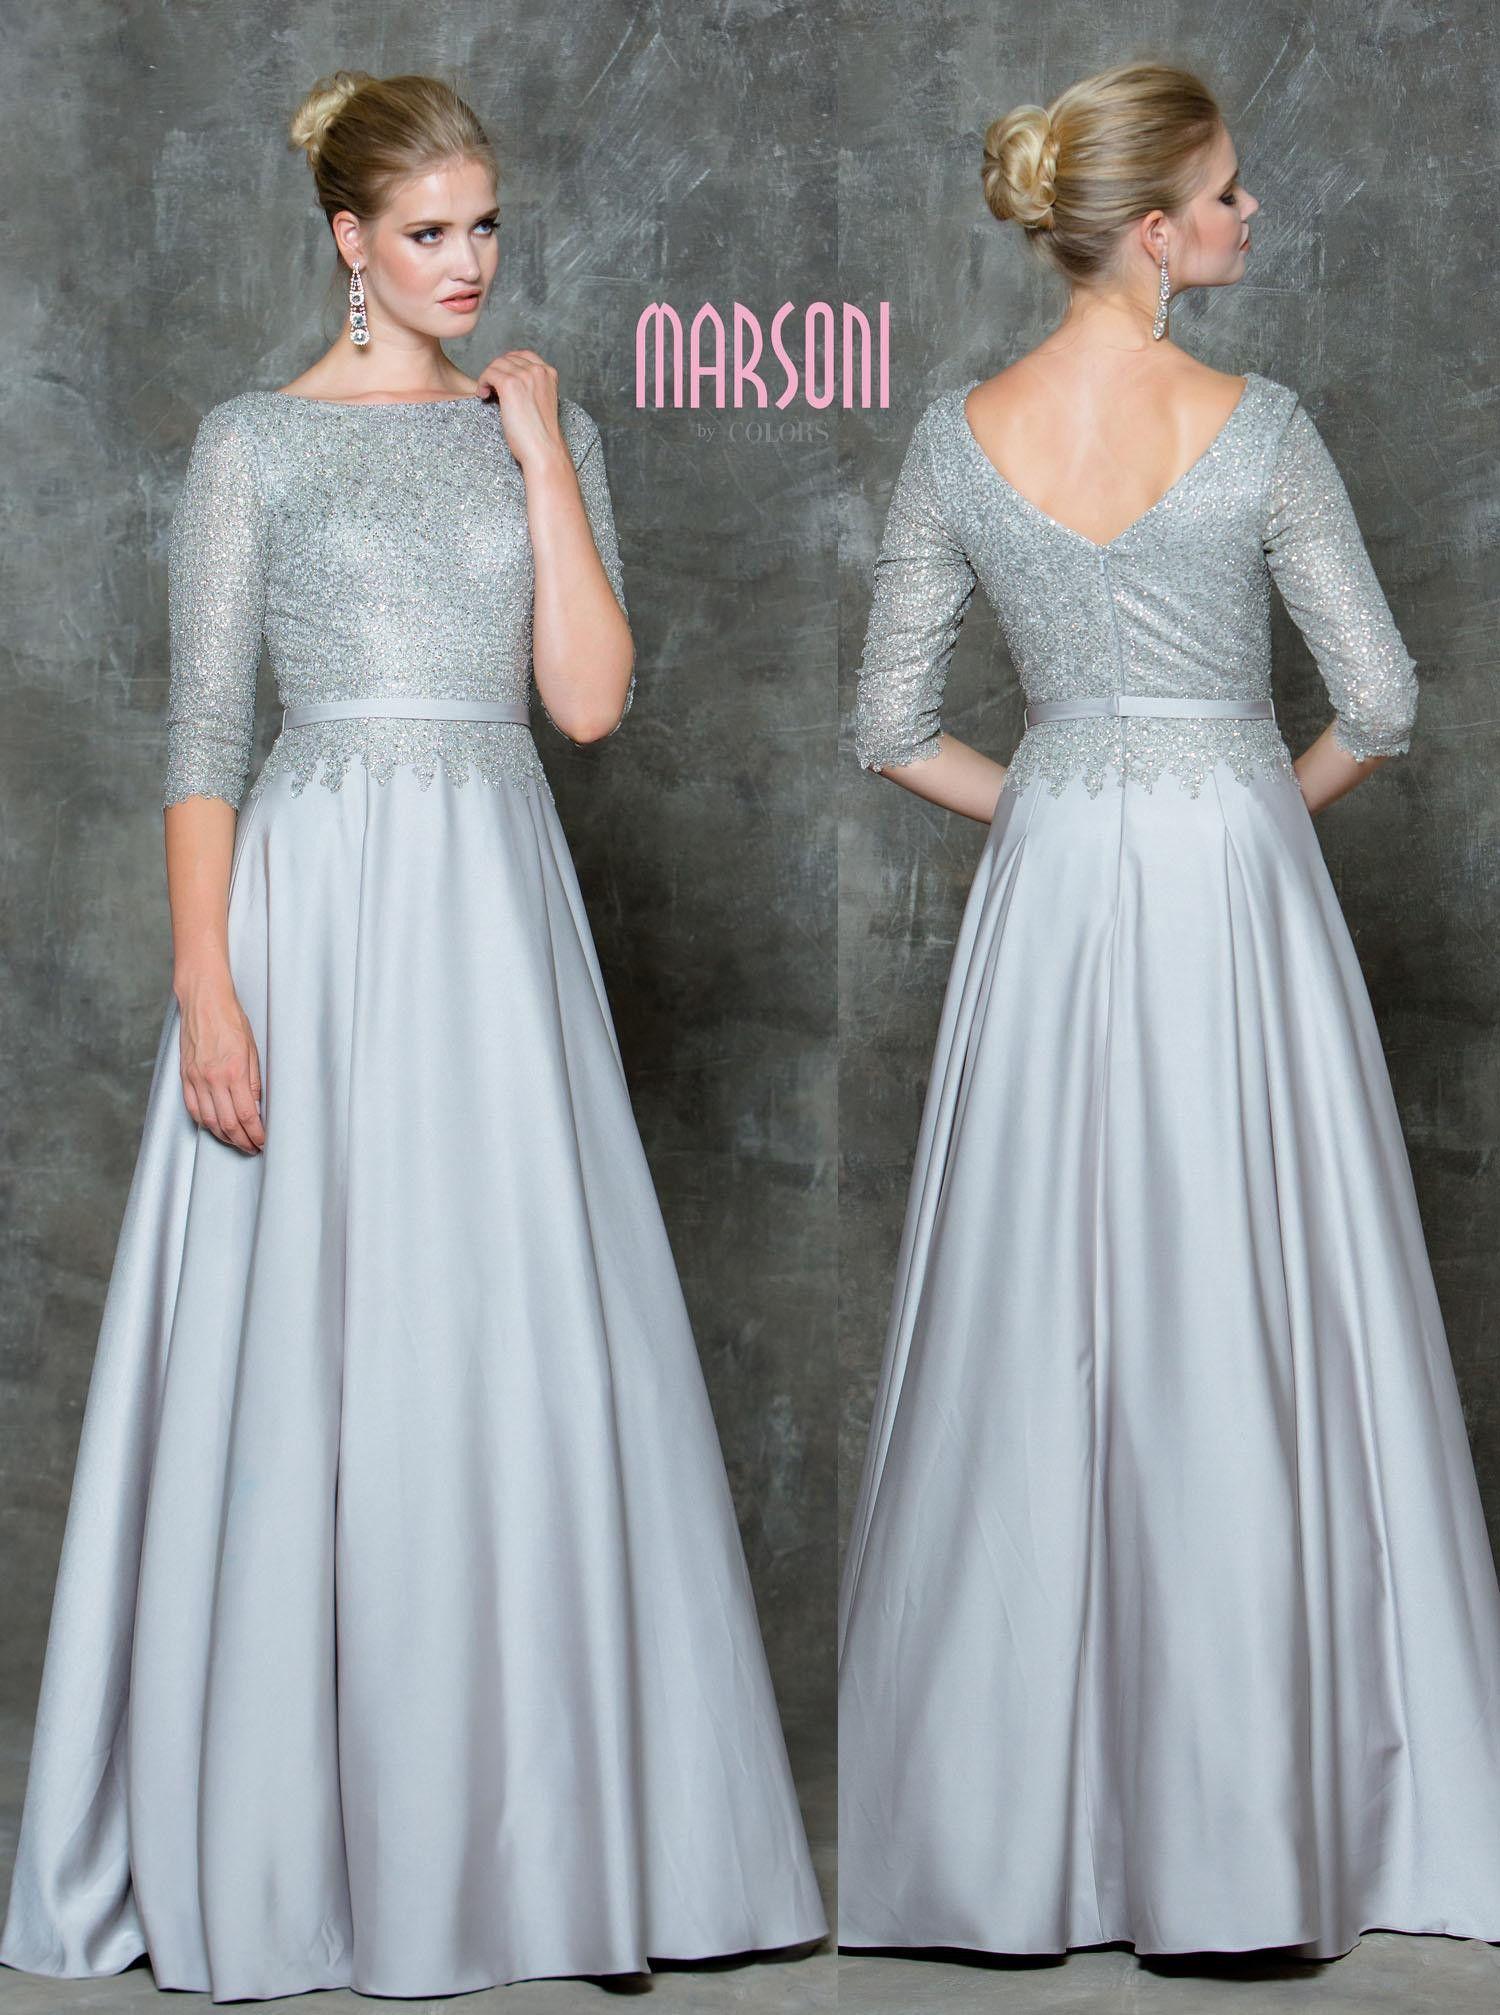 MARSONI M182 Dazzling Half Sleeve Mother of Bride Evening Dress ...